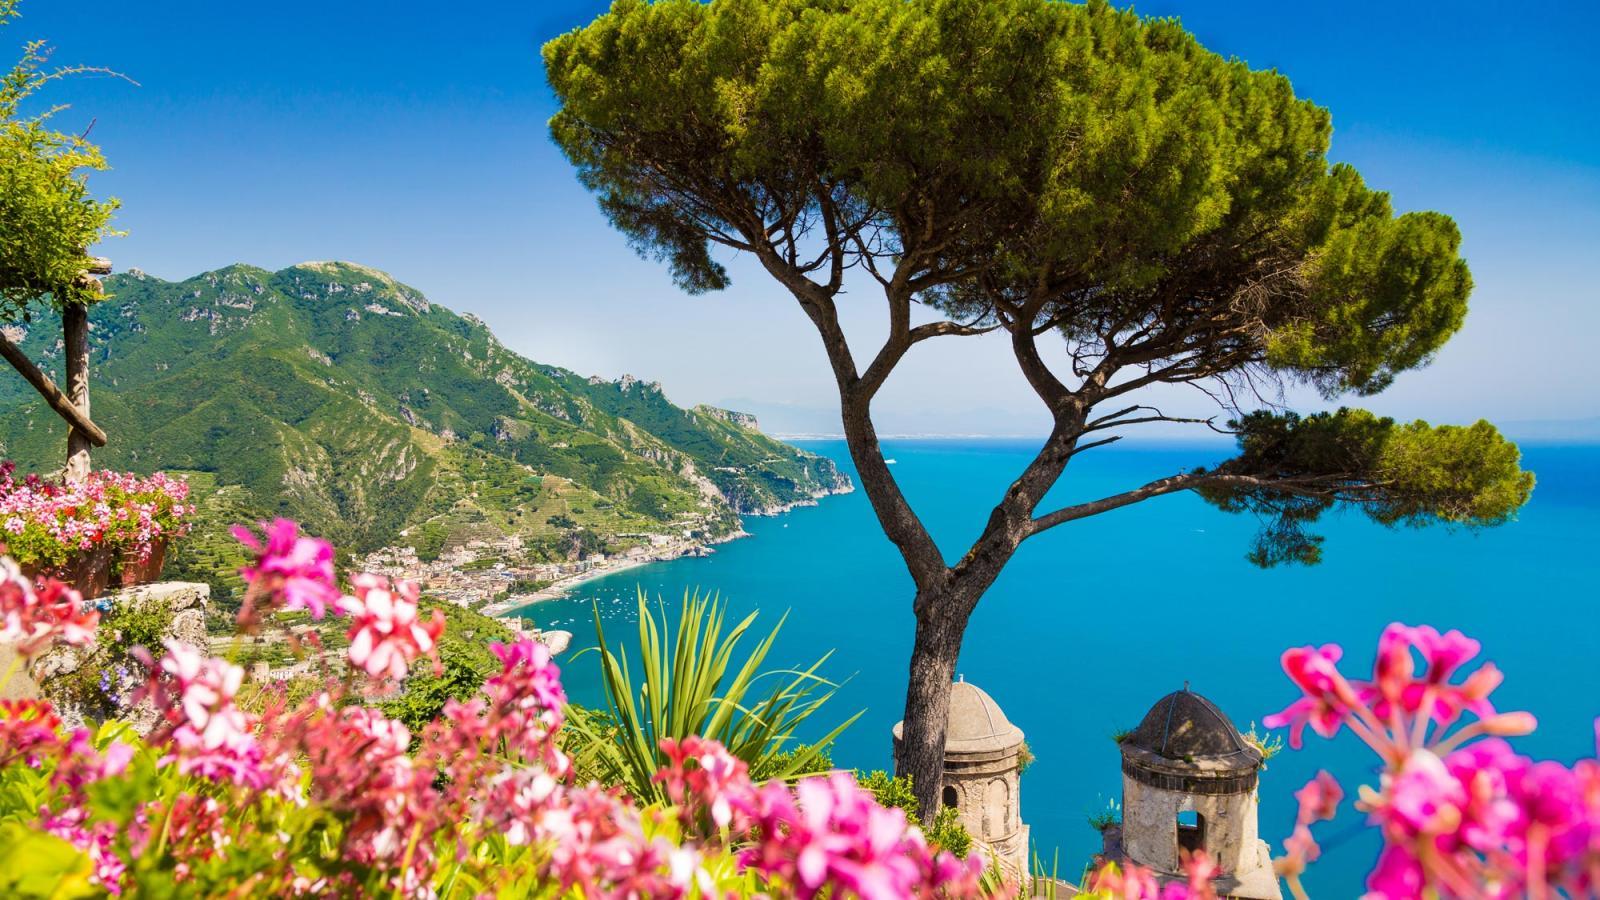 sorrento the amalfi coast holidays 2017 topflight. Black Bedroom Furniture Sets. Home Design Ideas